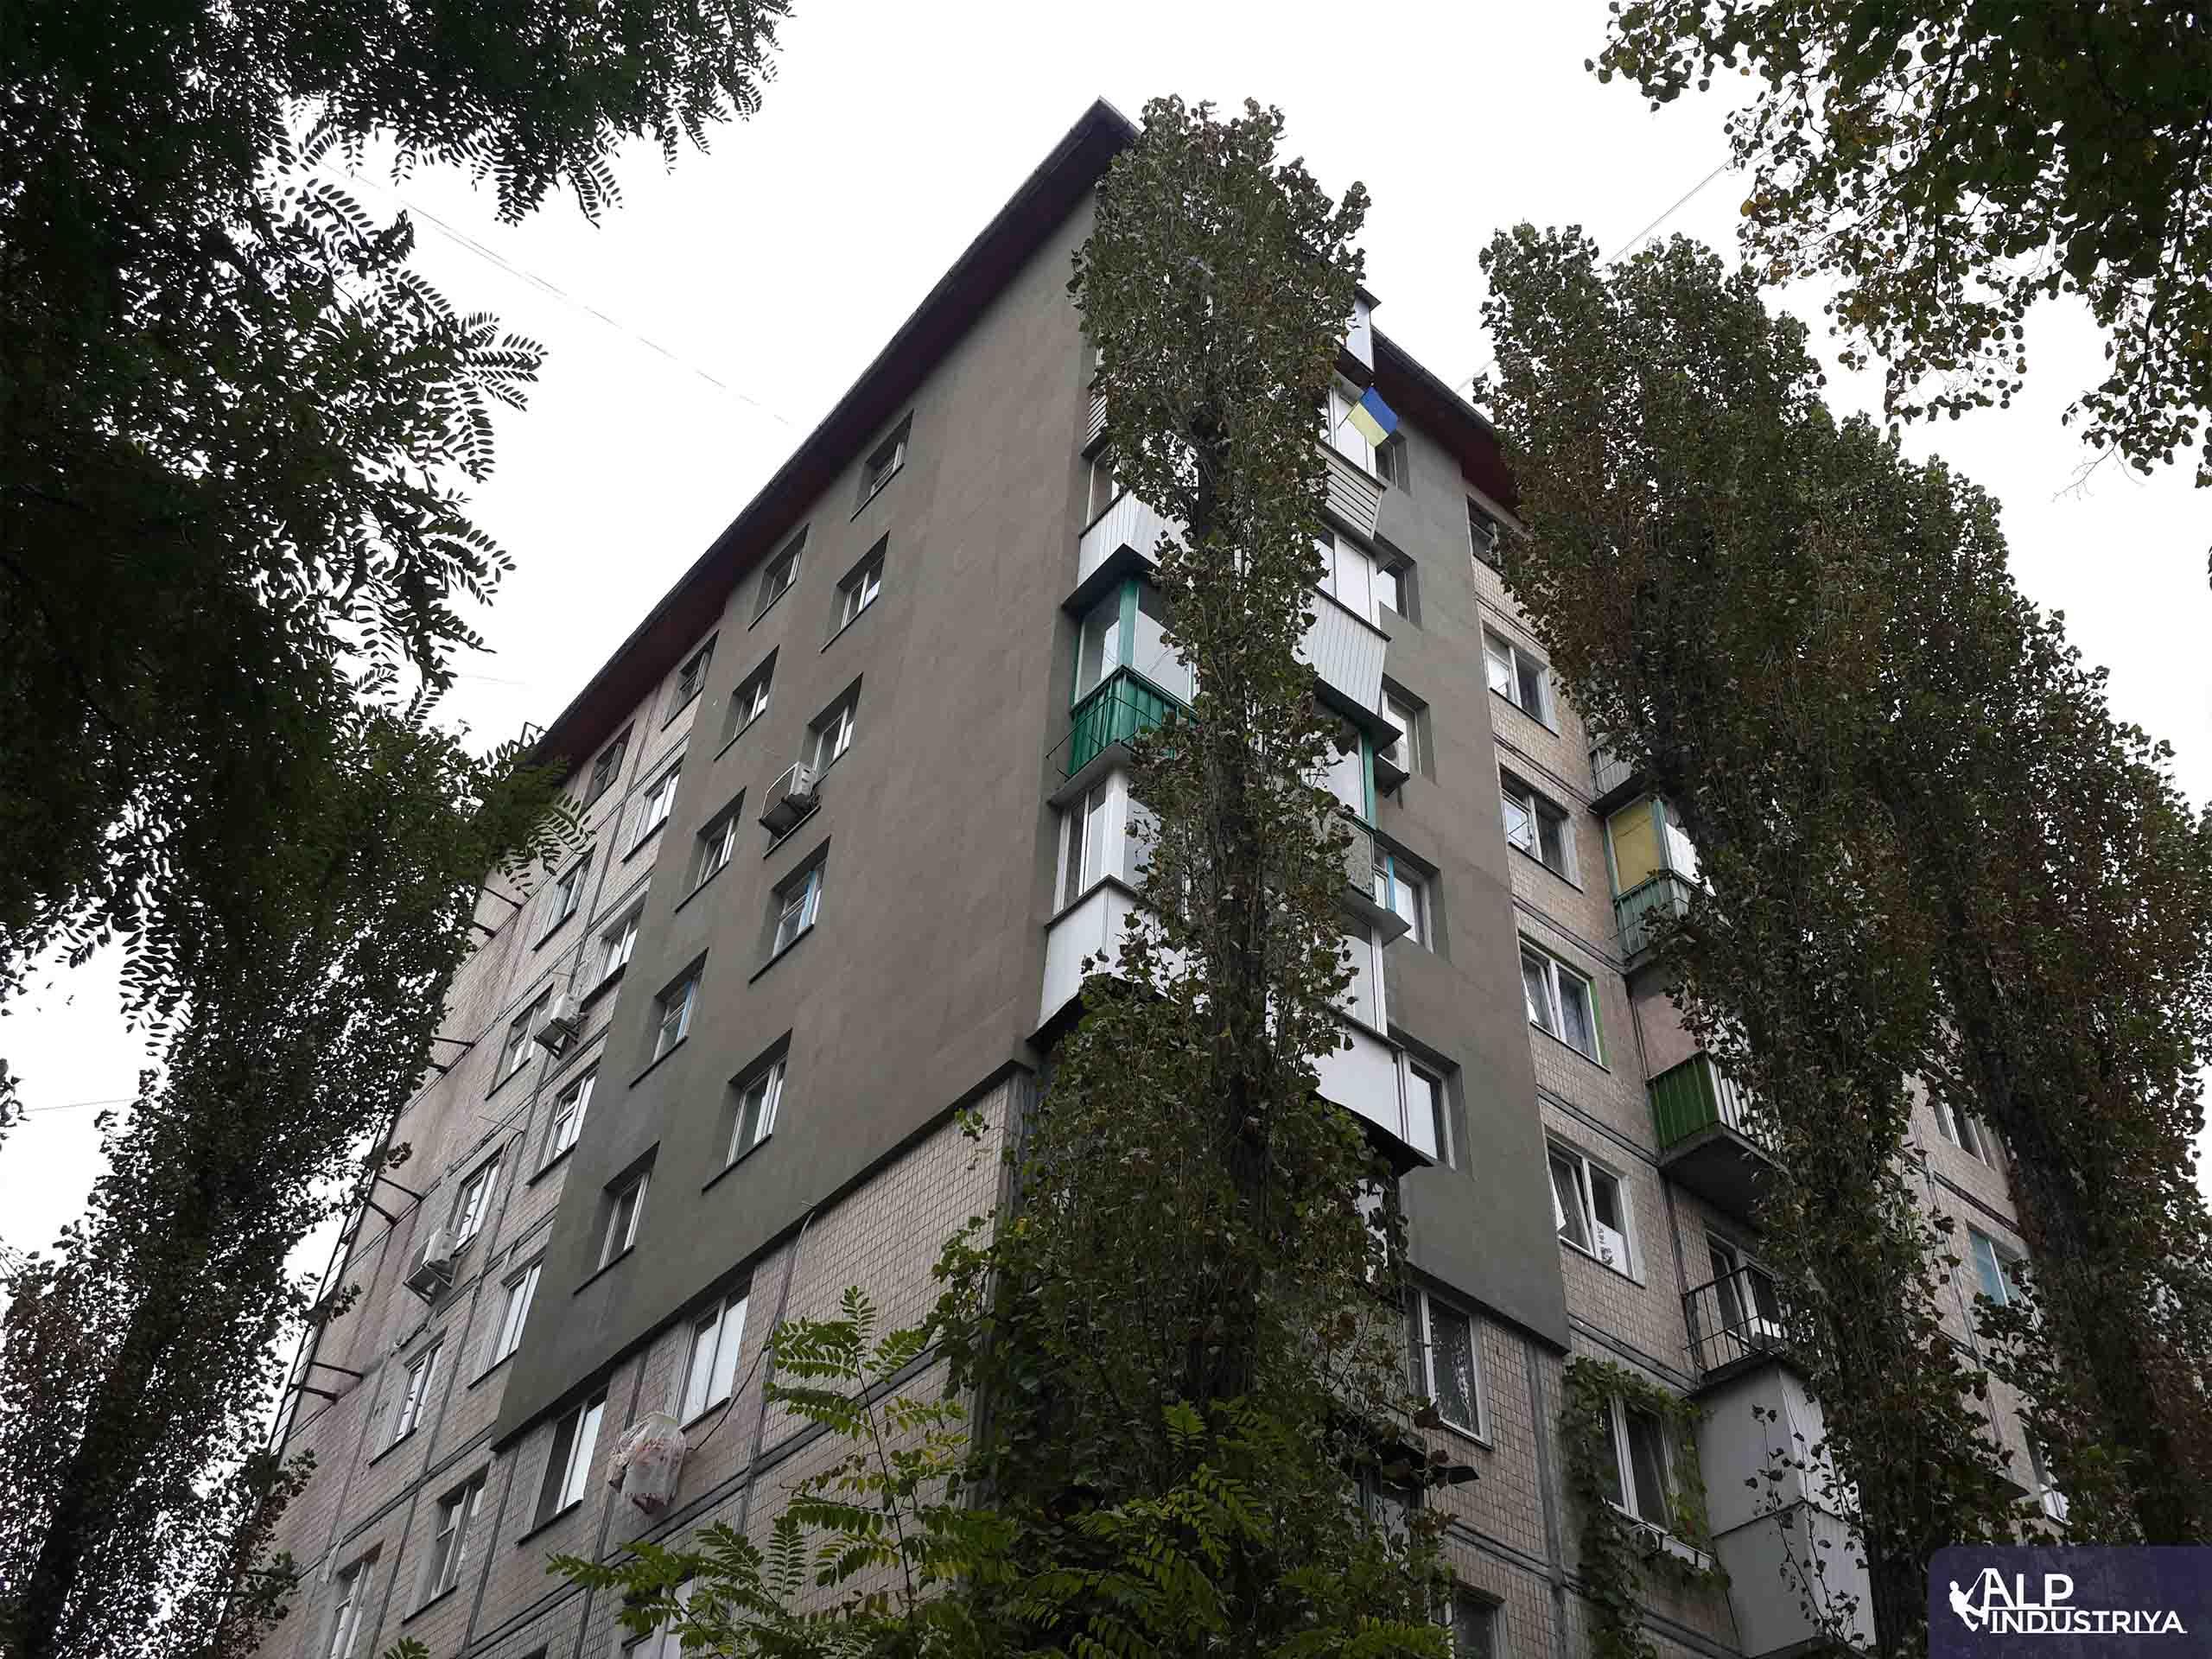 Теплоизоляция стен и углов многоквартирного дома промальпами-5